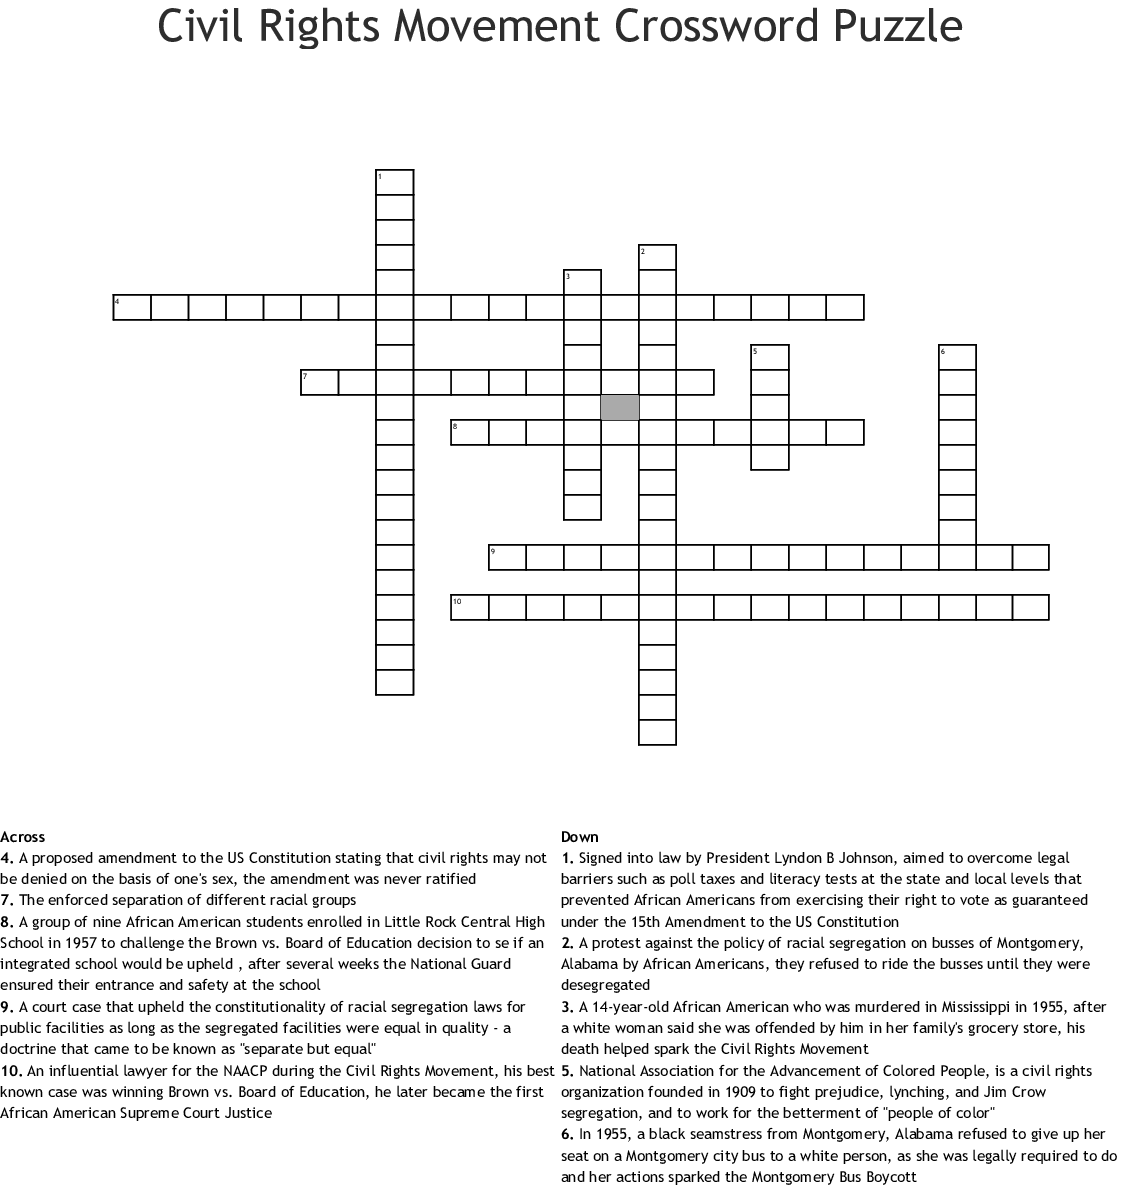 Civil Rights Movement Crossword Puzzle Crossword